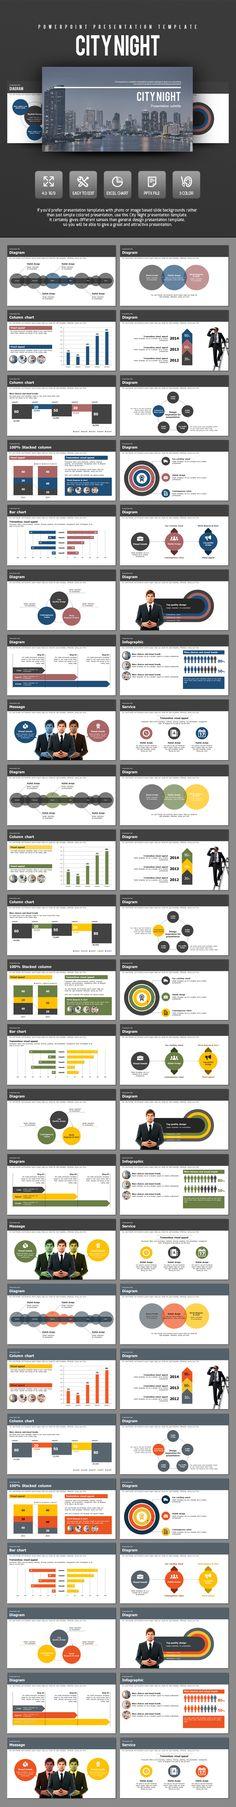 City Night PowerPoint Template #design #slides Download: http://graphicriver.net/item/city-night/14113800?ref=ksioks